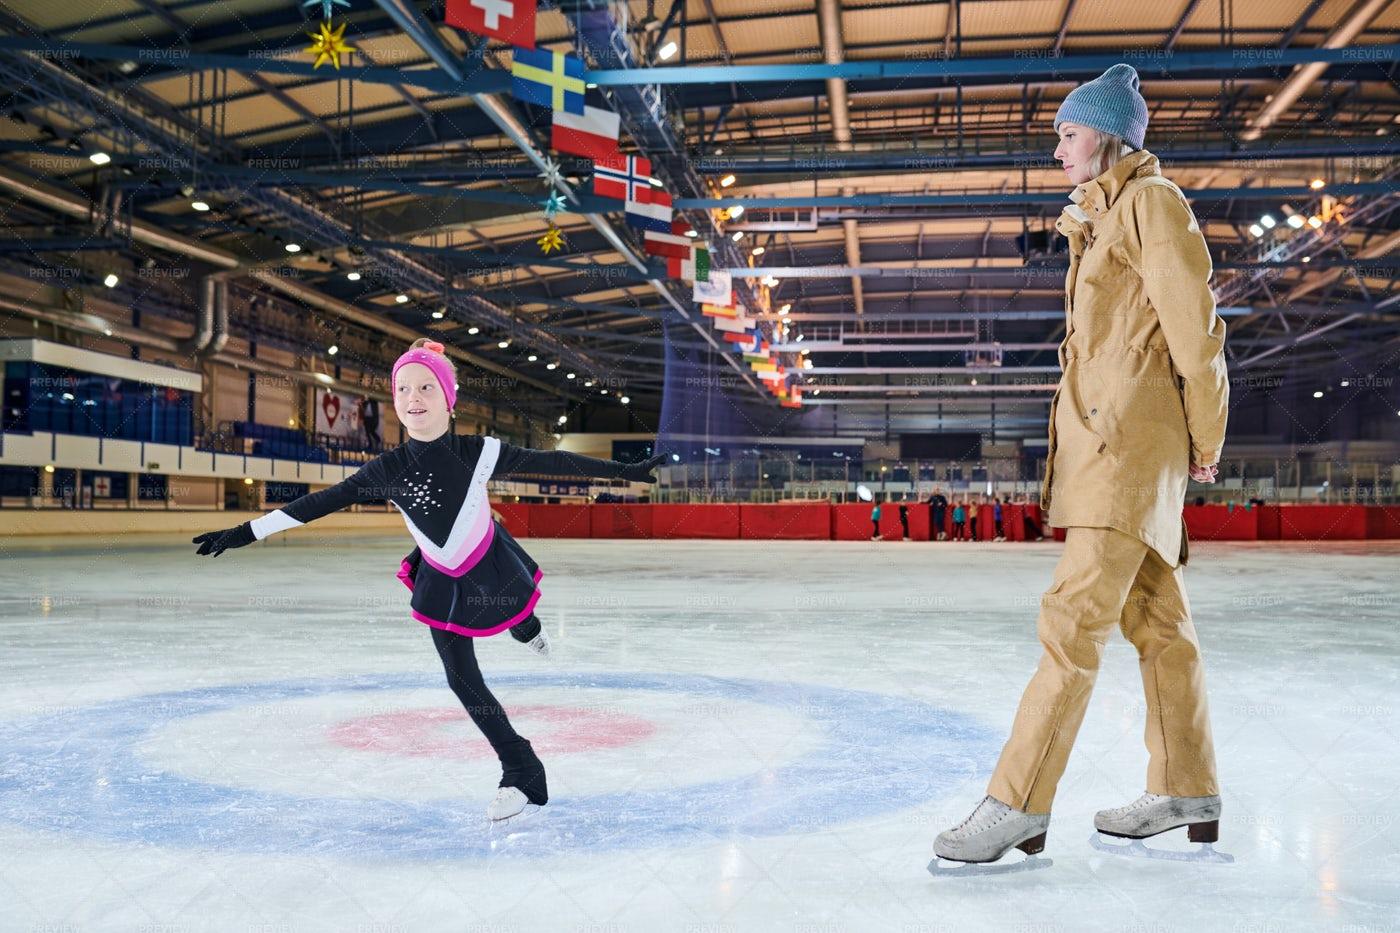 Girl Ice-Skating In Training: Stock Photos